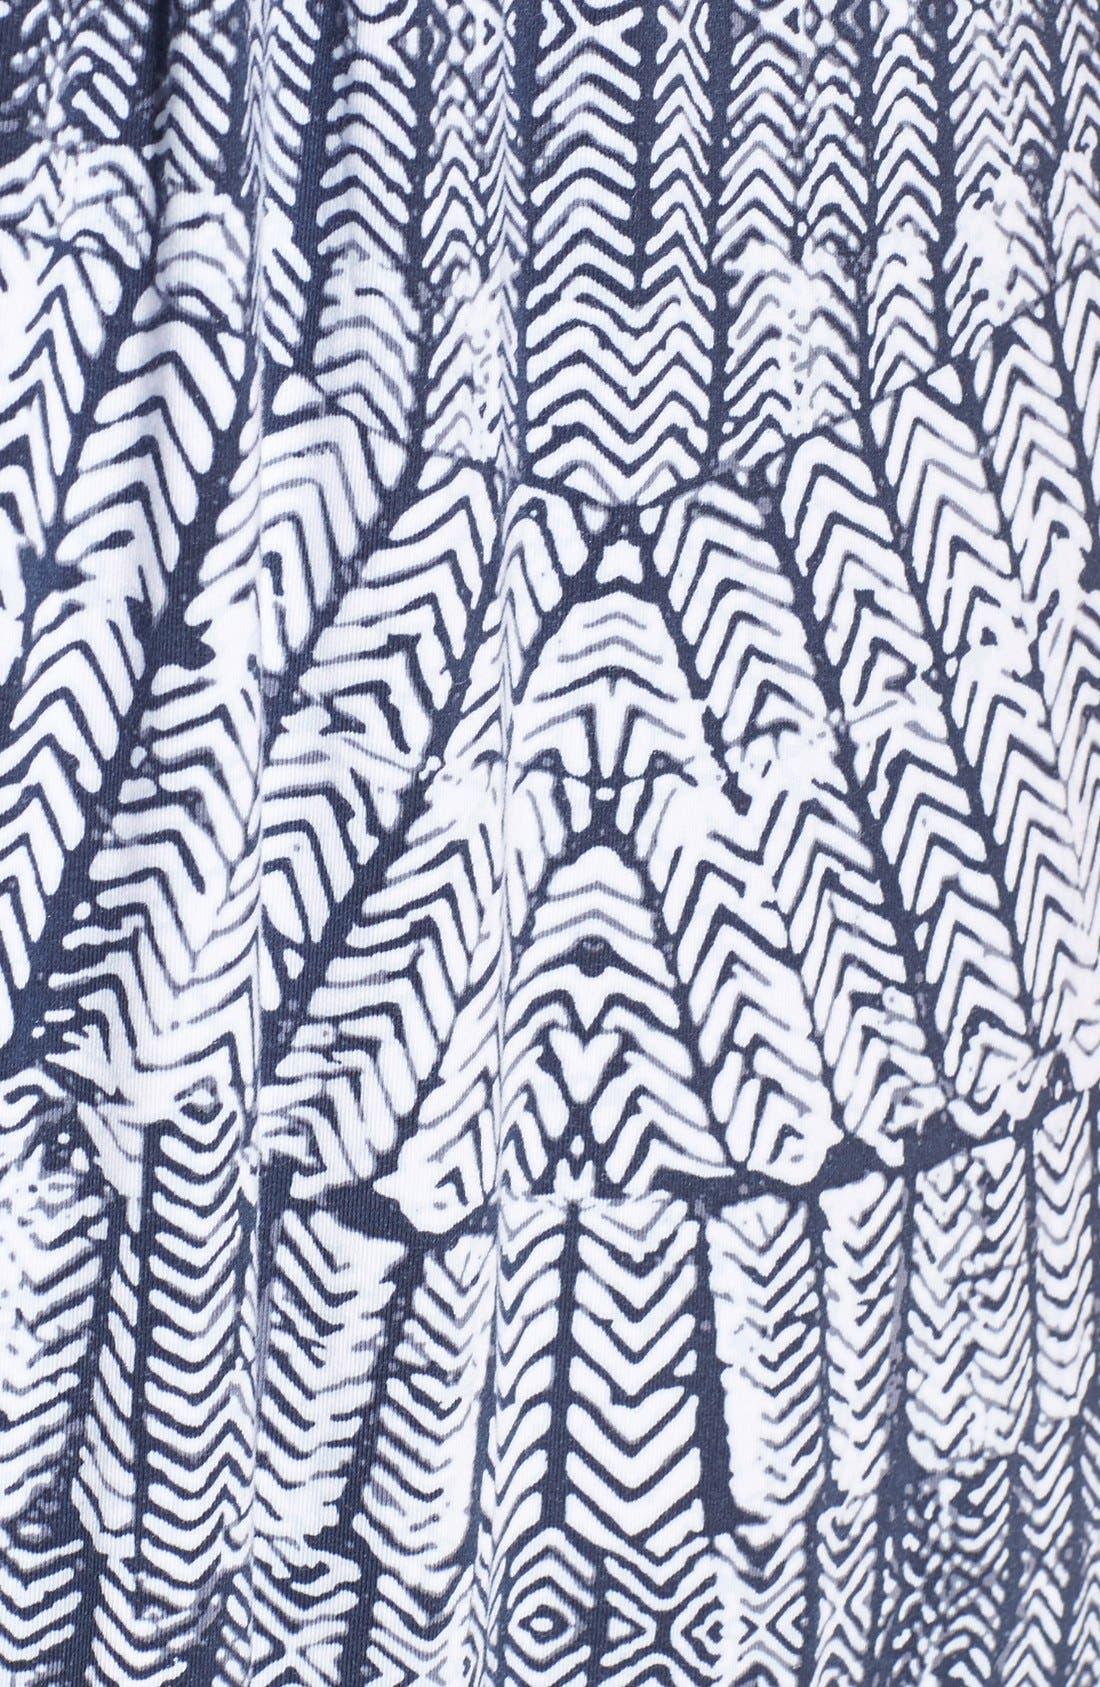 Chloe Empire Waist Maxi Dress,                             Alternate thumbnail 78, color,